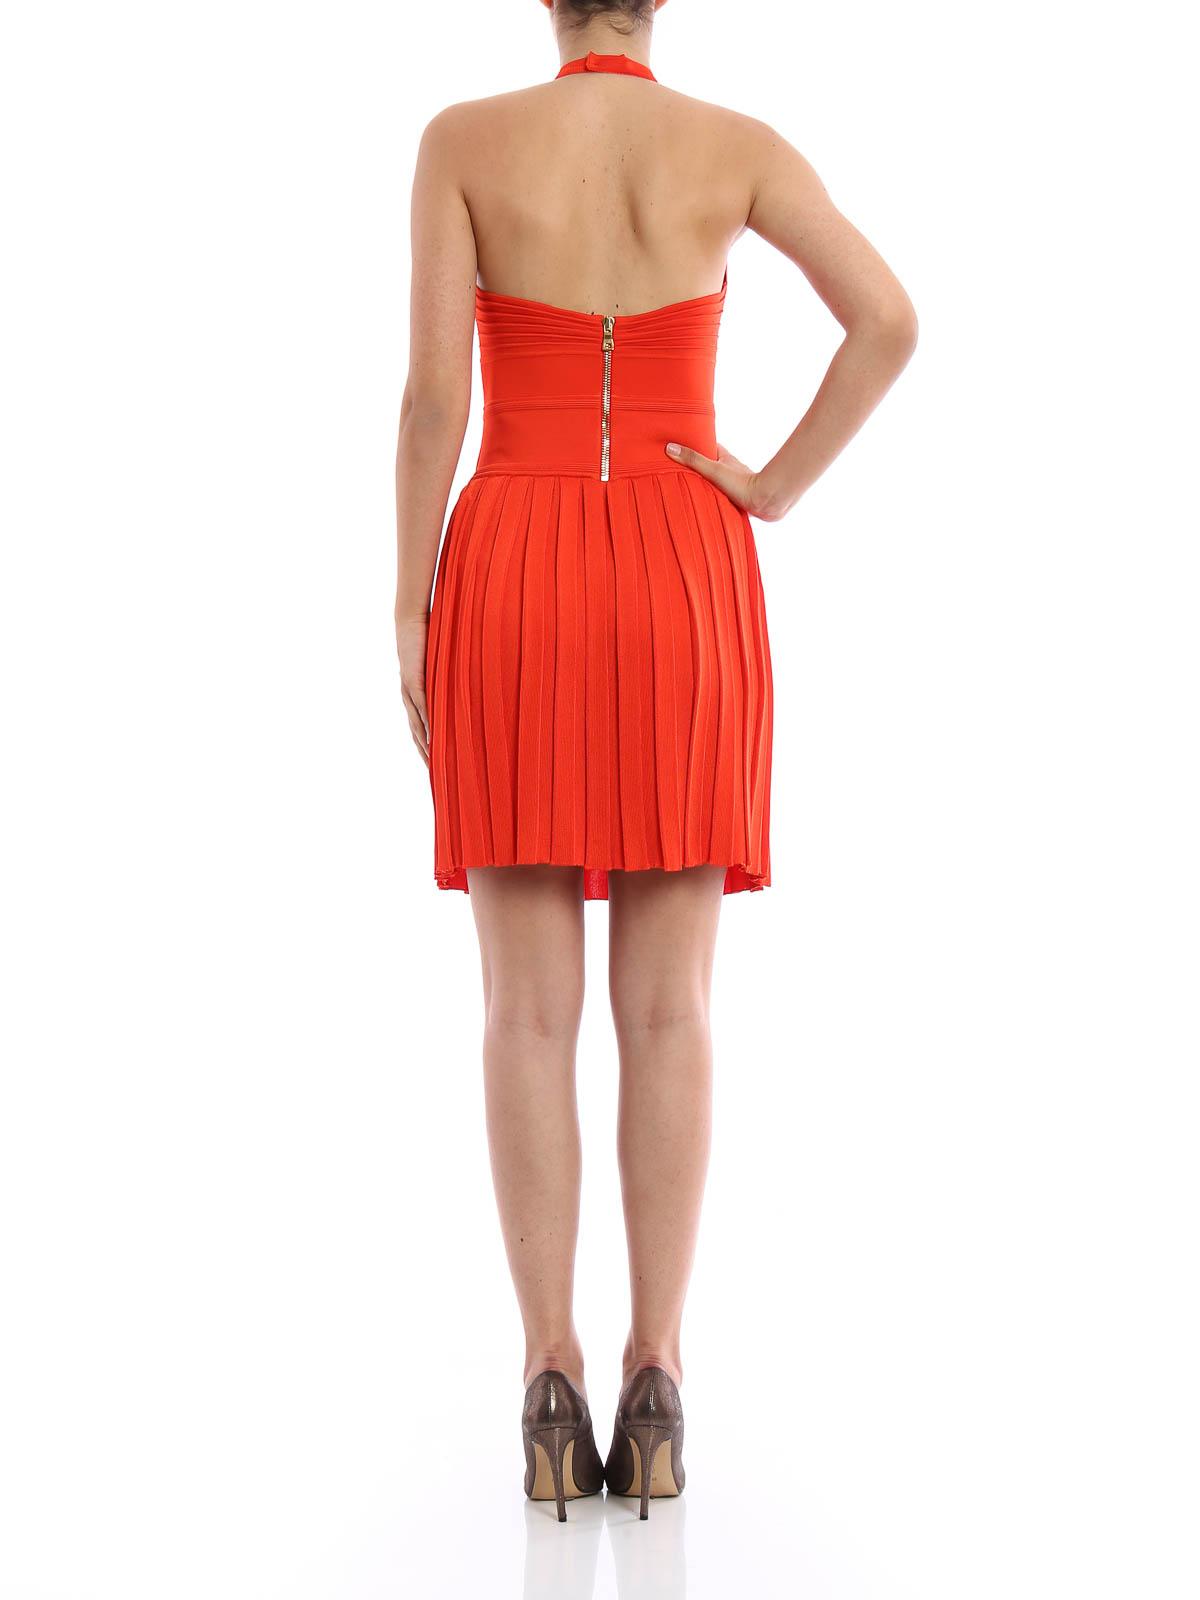 Balmain dress buy online